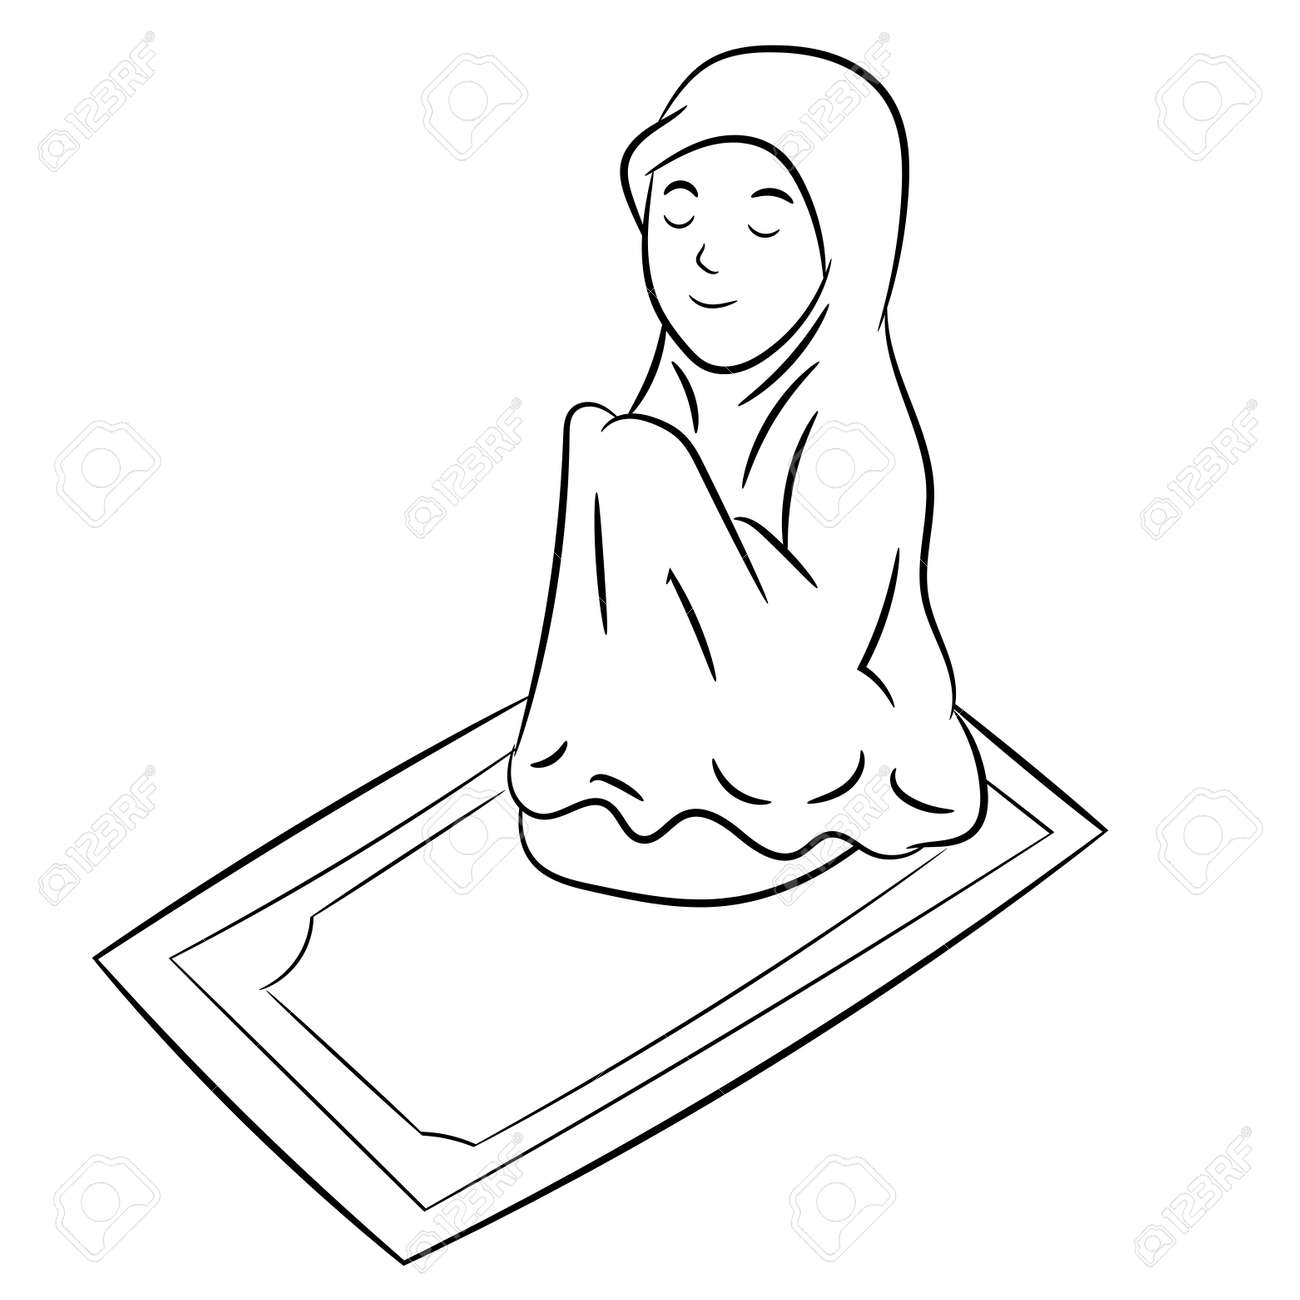 Muslim Girl Praying Isolated On White Background Black And White